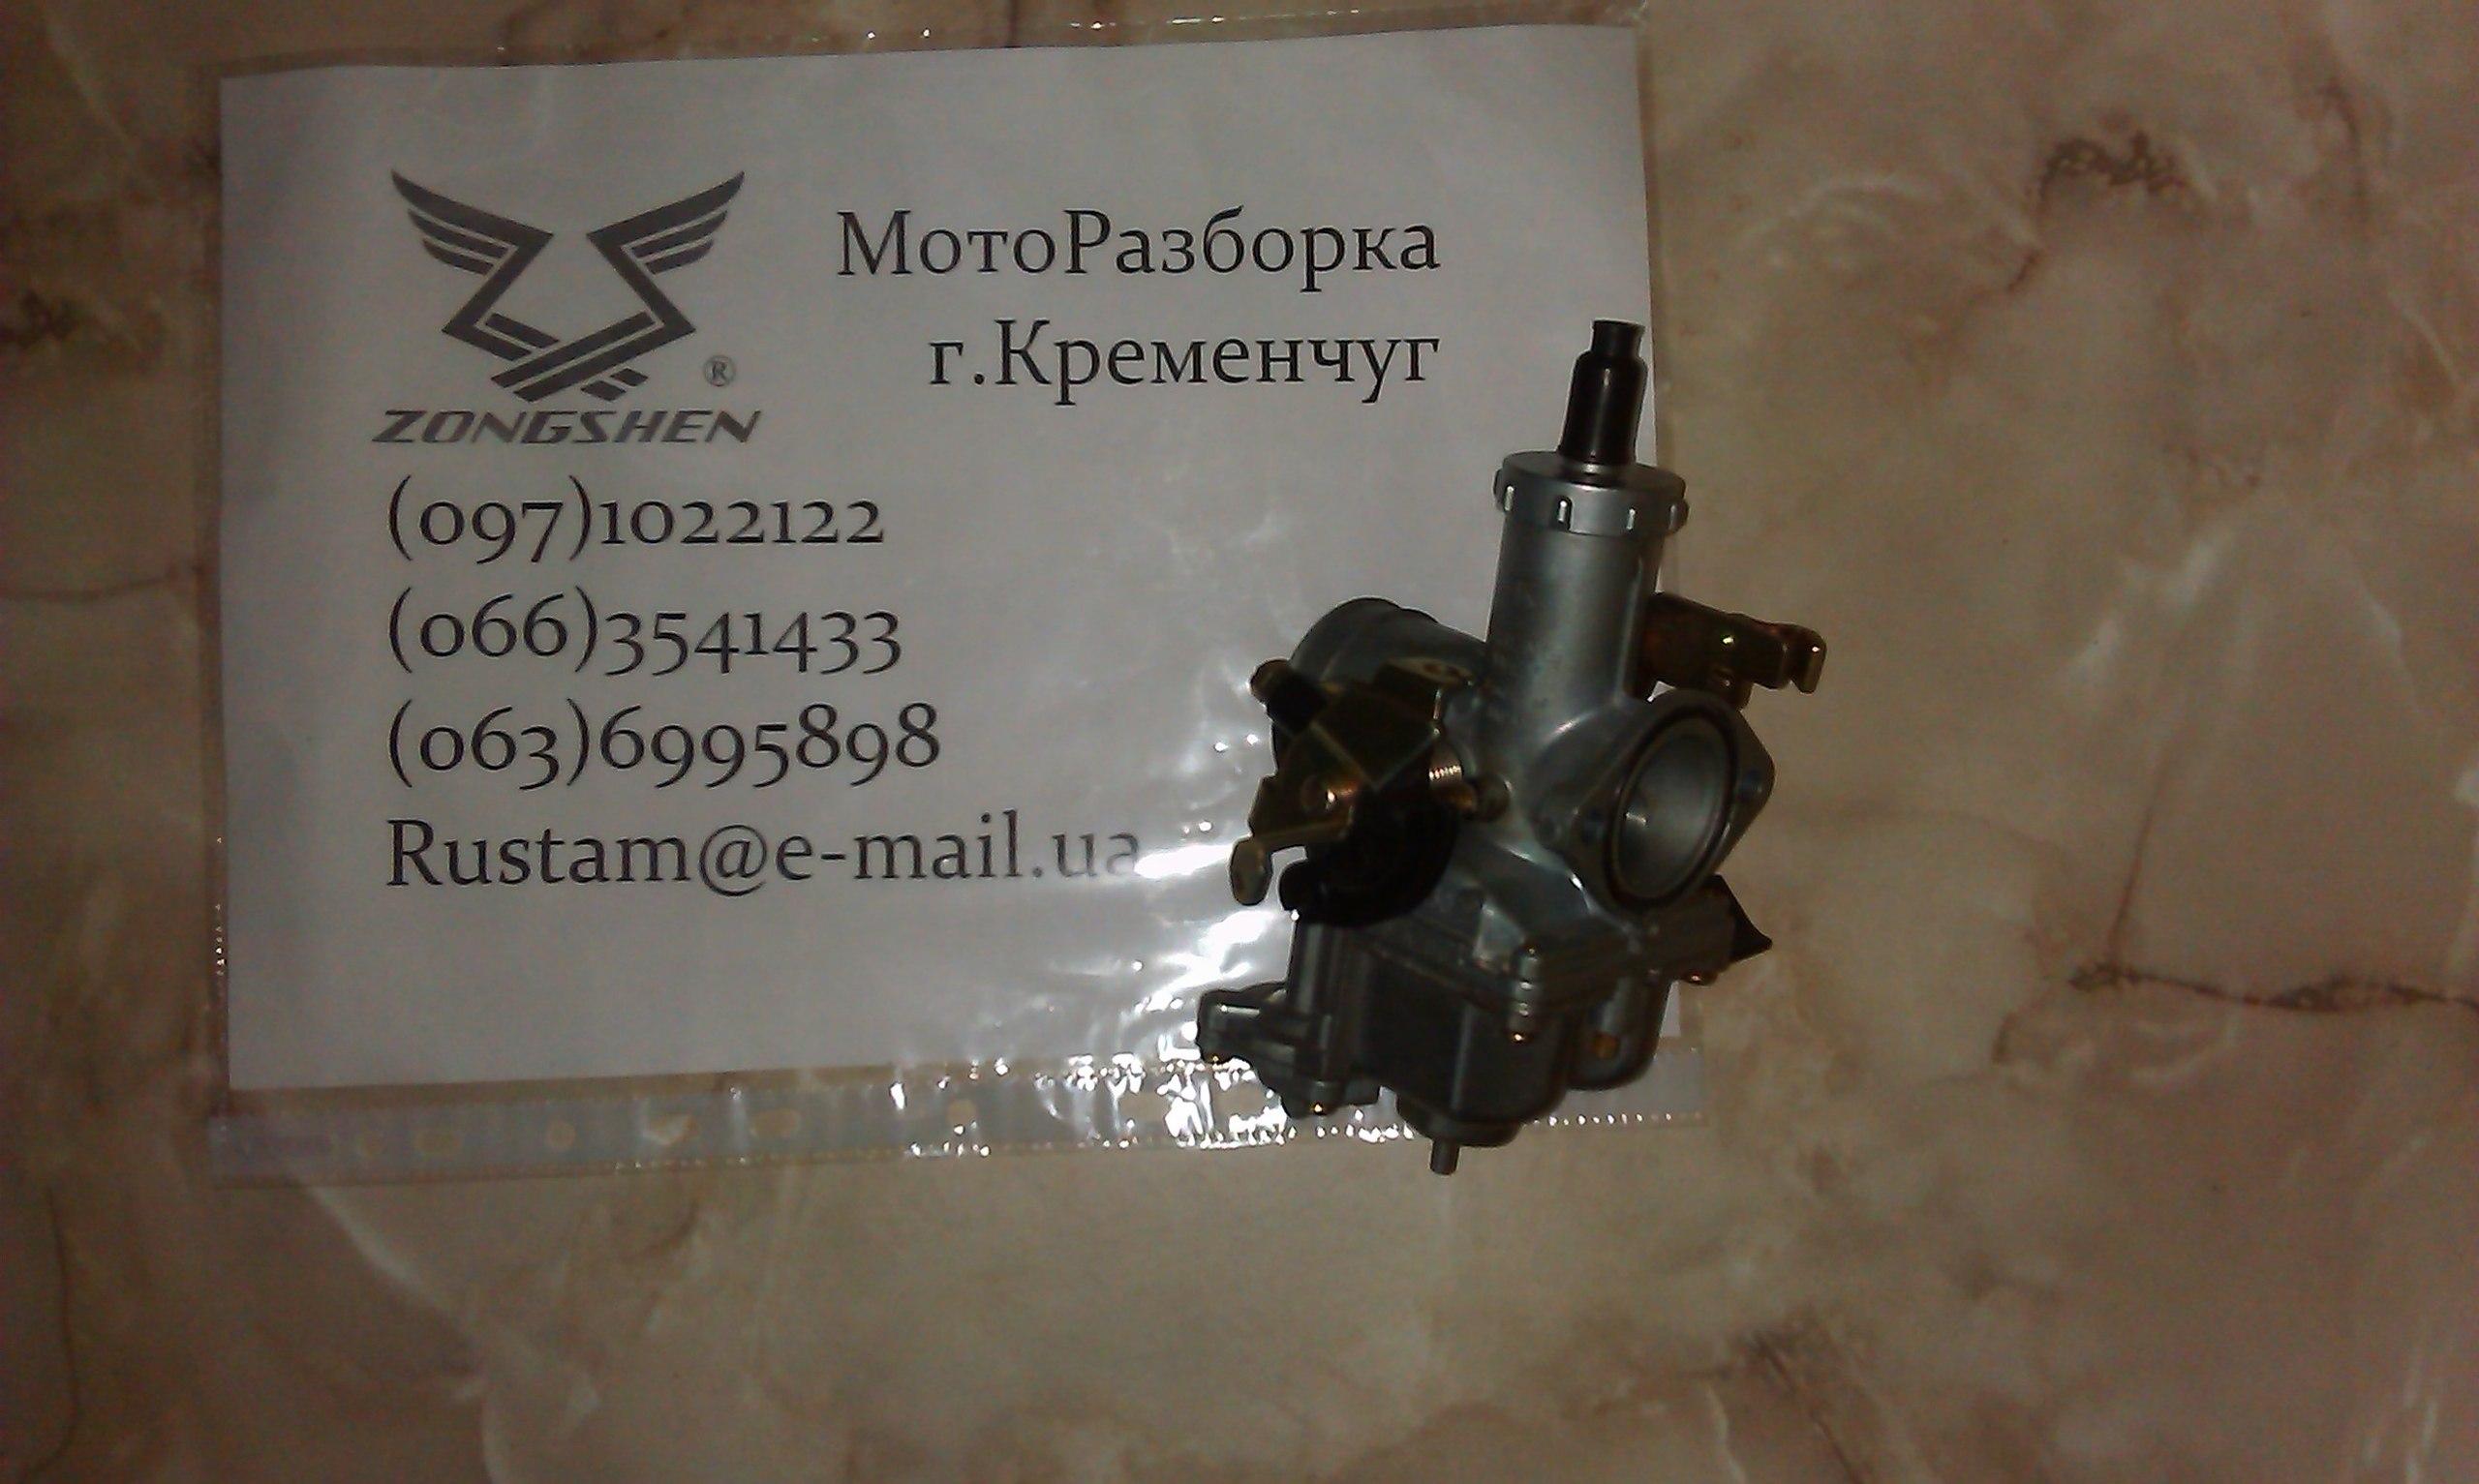 МотоРазборка г.Кременчуг Zongshen 200-250, Suzuki bandit 400-1, Venom 200 IRVyzaMHsCE